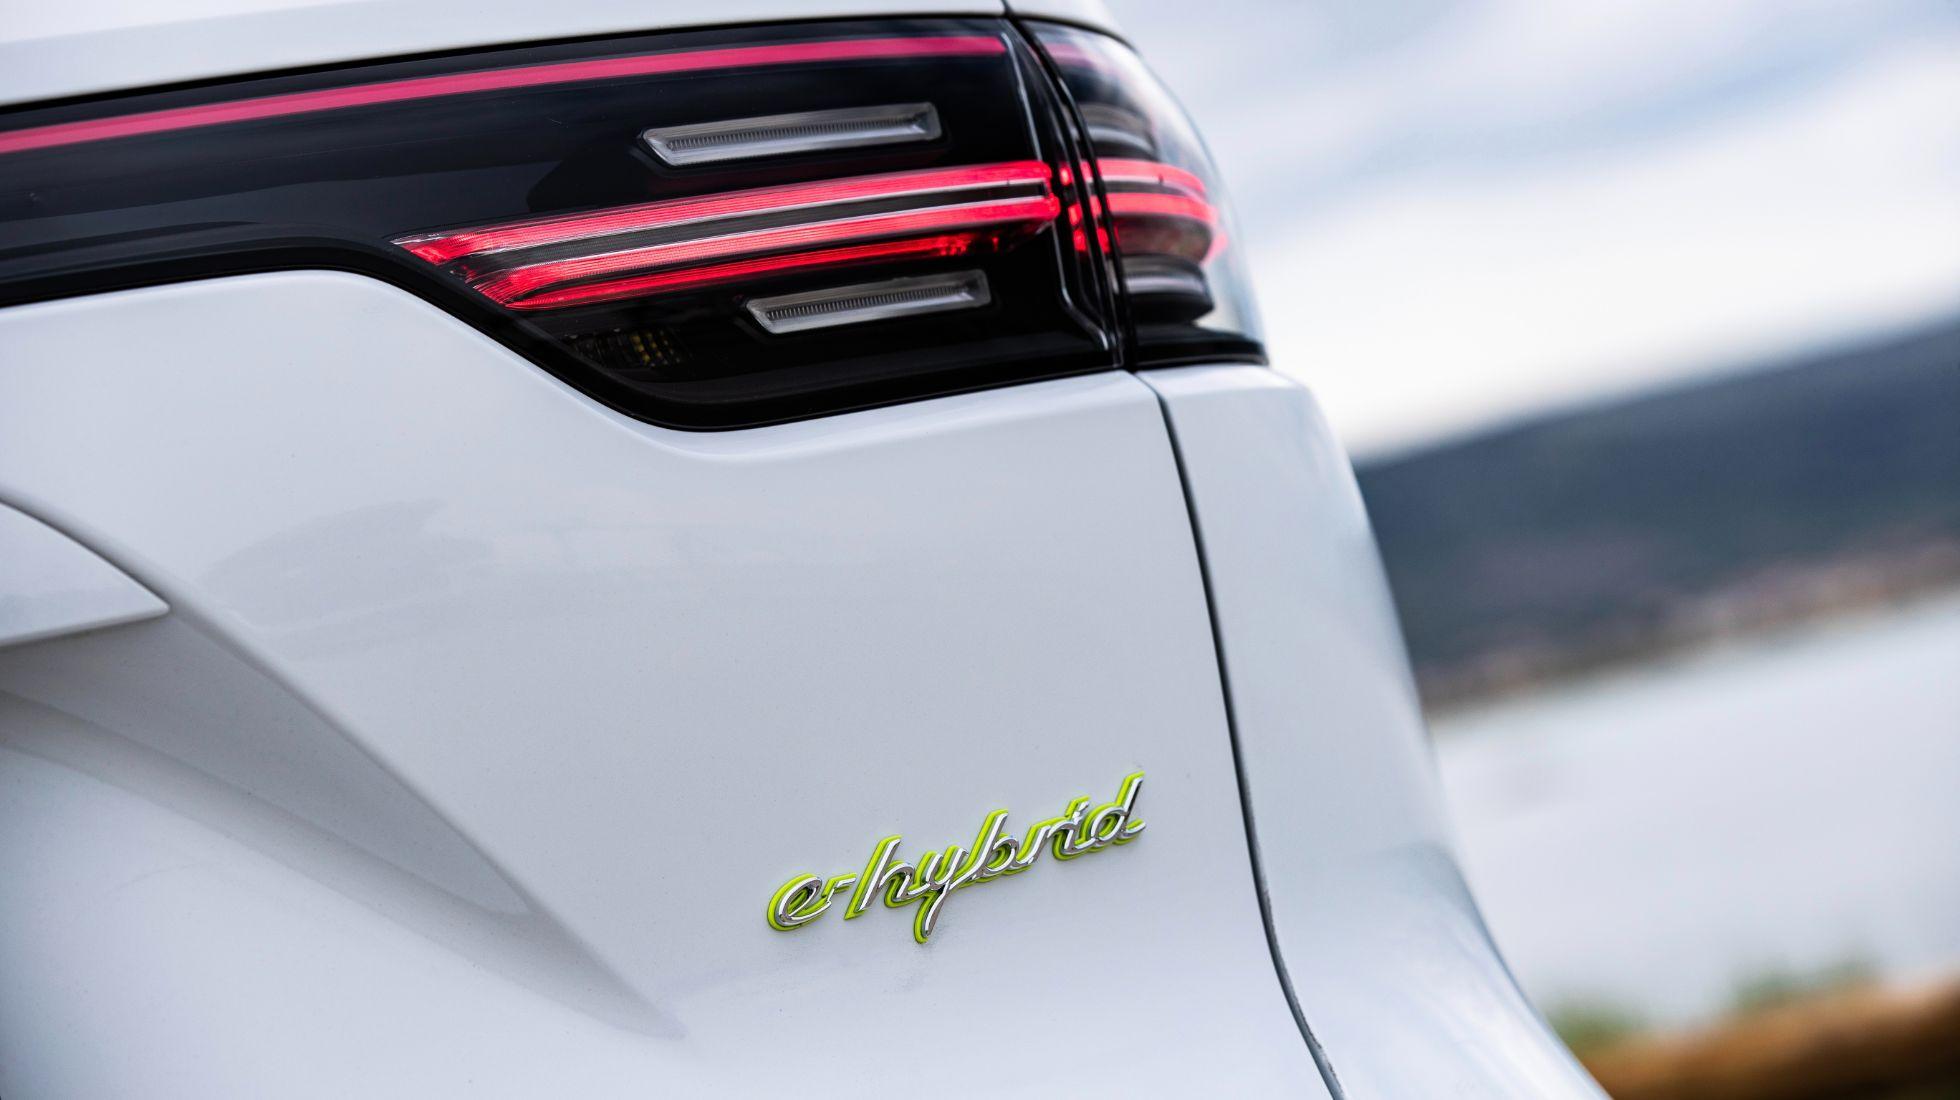 Porsche Cayenne e-hybrid models now boast additional electric range